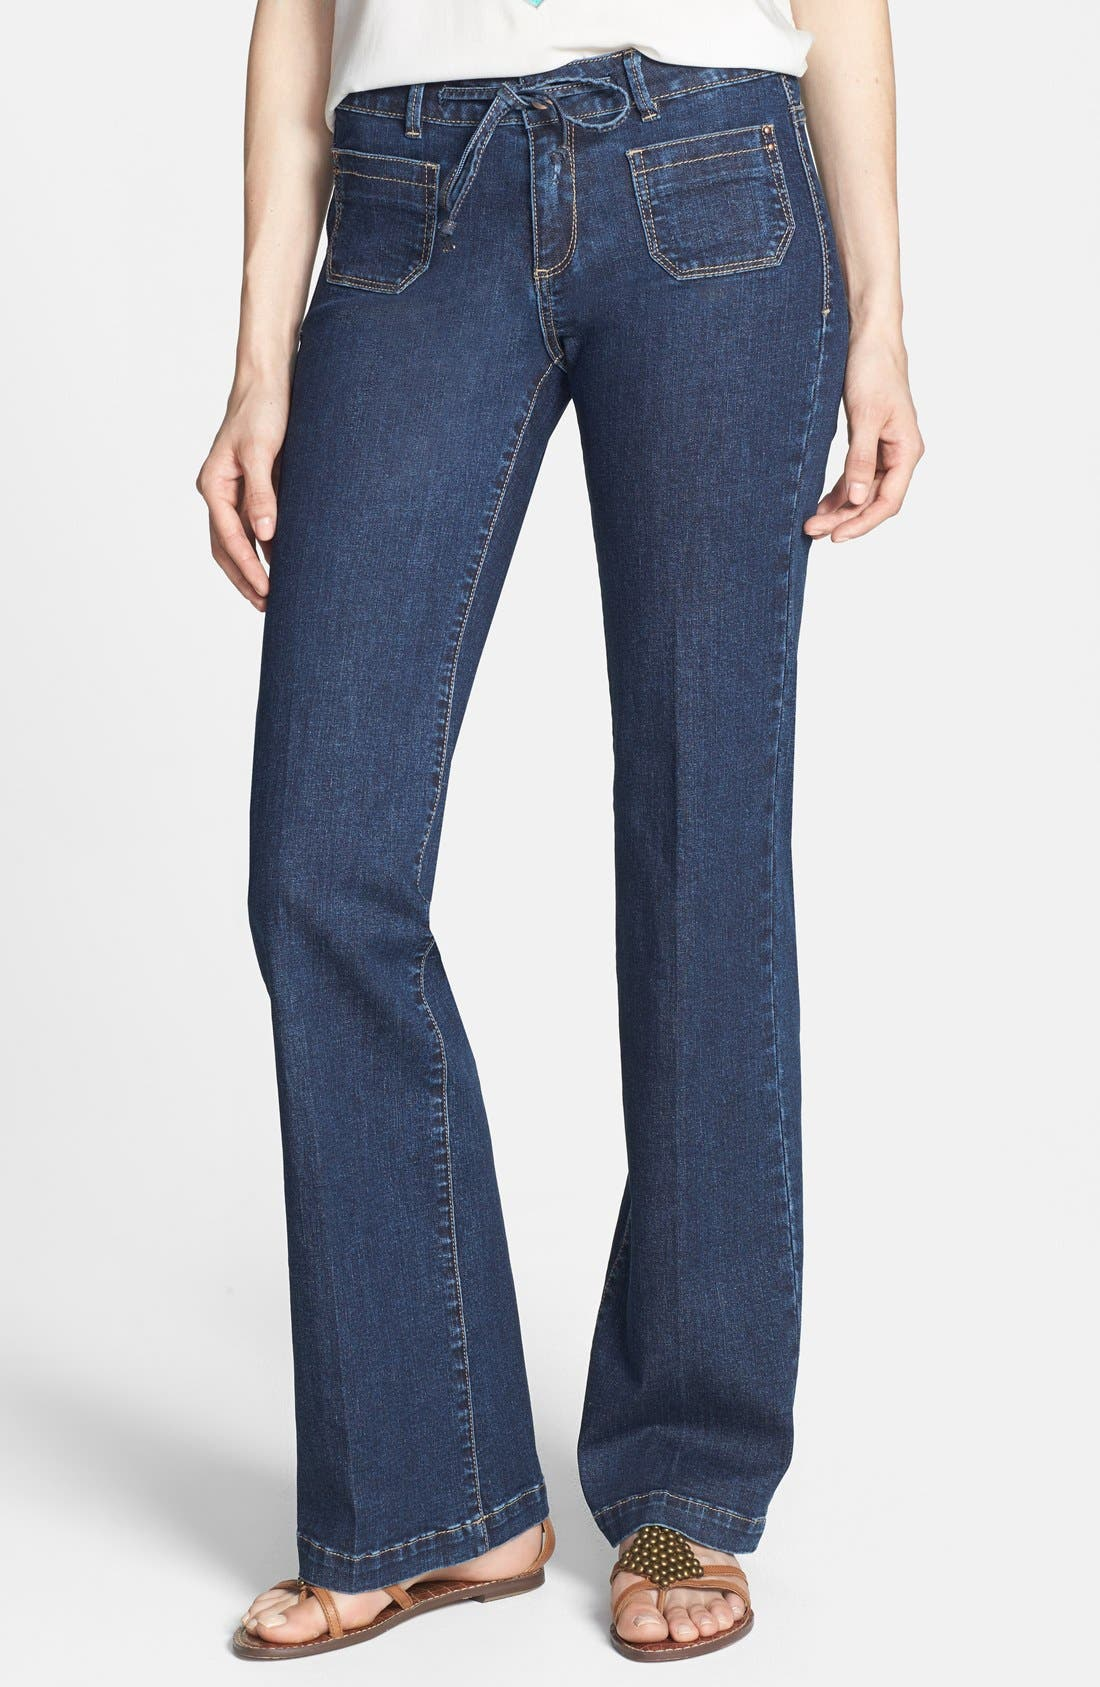 Main Image - HART Denim 'Pheona' Wide Leg Trouser Jeans (Carbon) (Juniors)